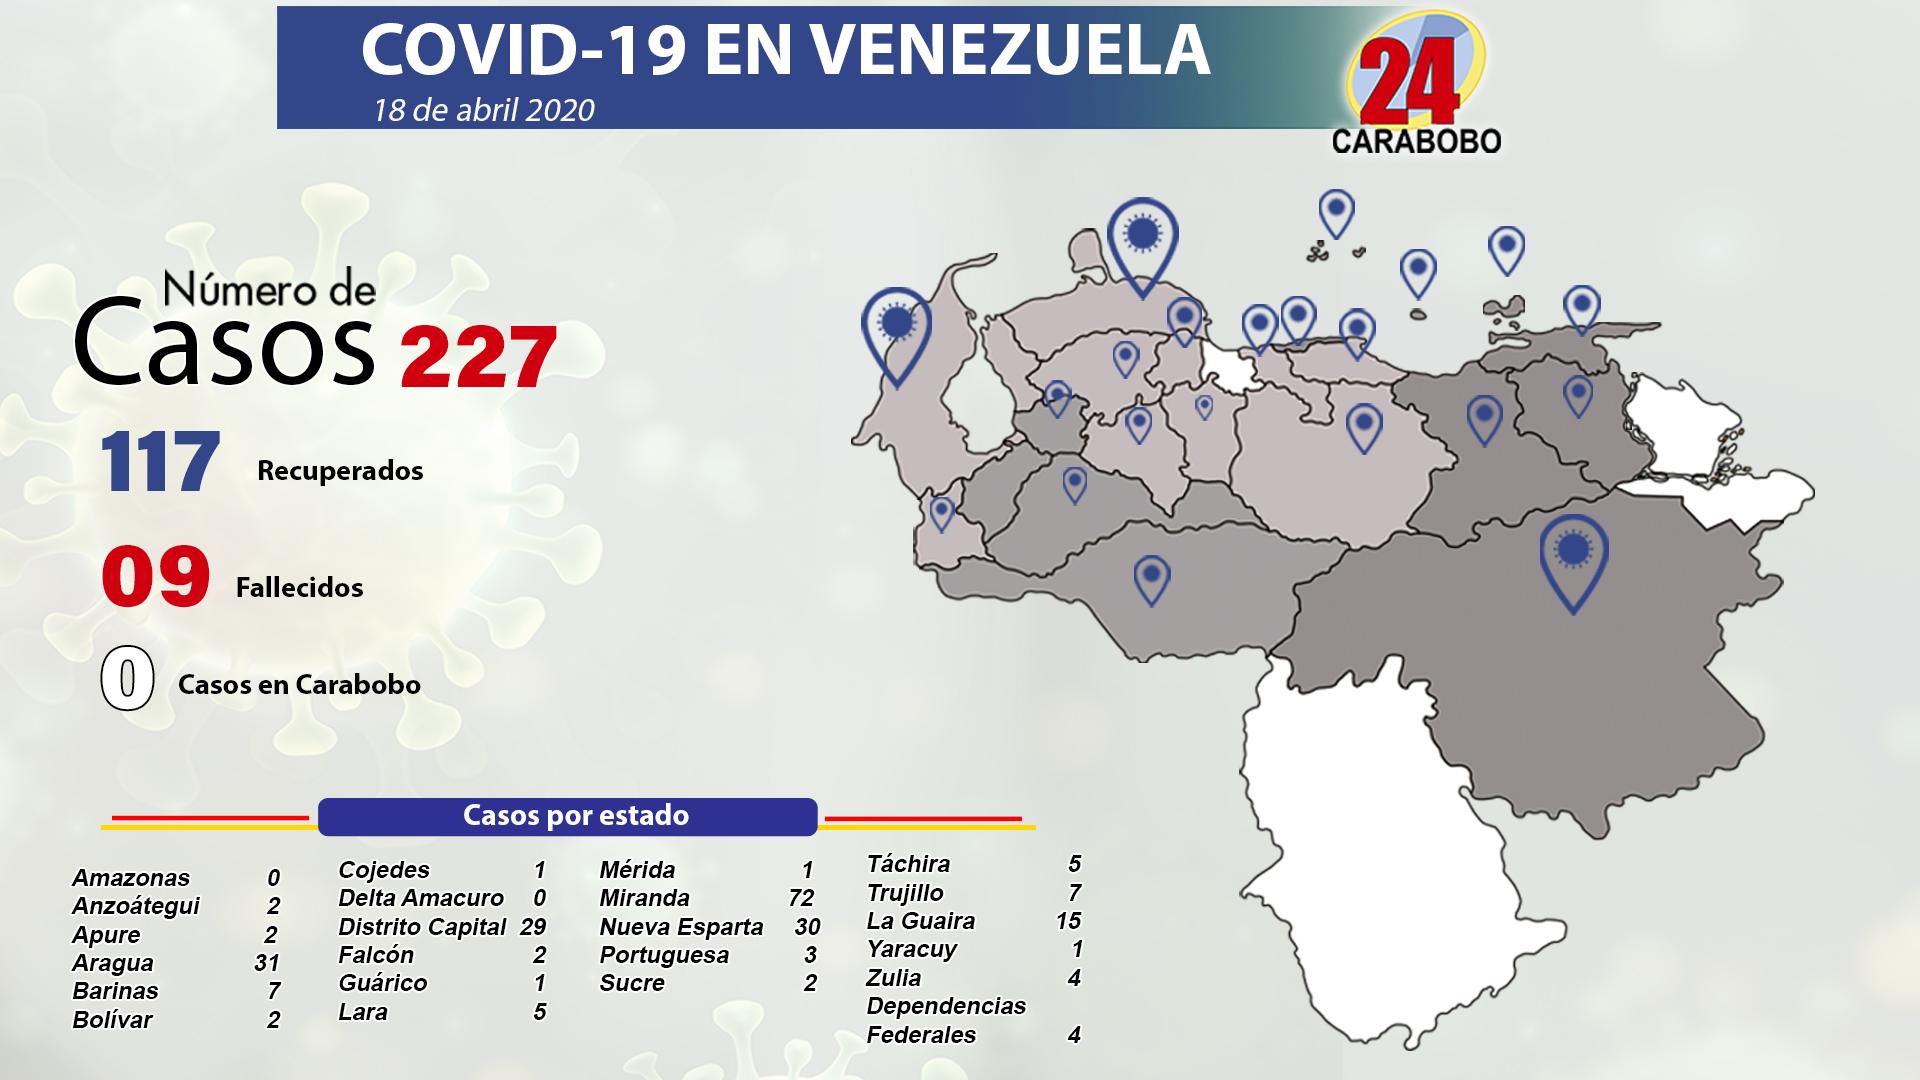 Cifra de casos de Covid 19 en Venezuela - Cifra de casos de Covid 19 en Venezuela